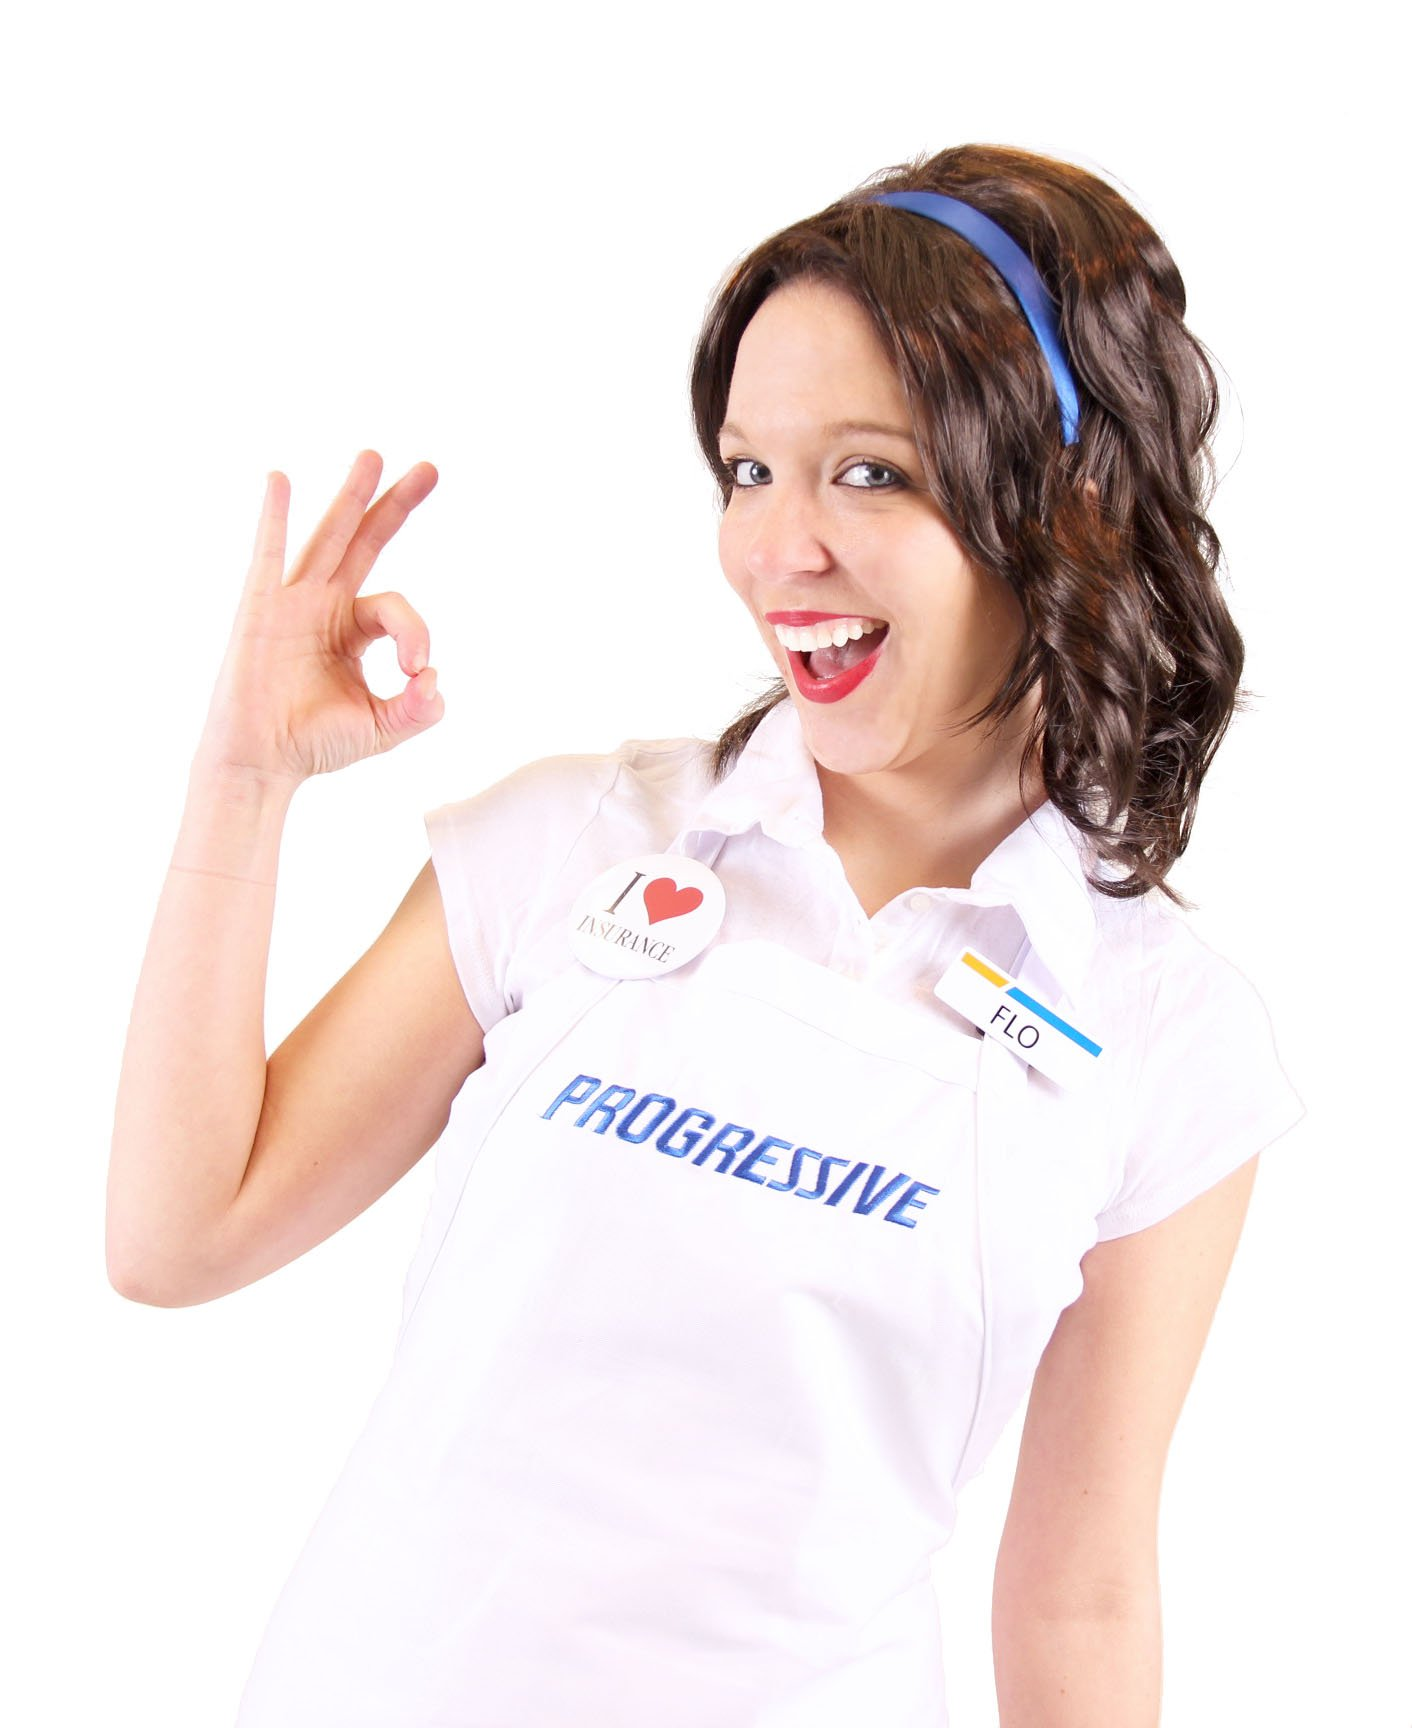 Progressive Flo Costume Set - ST by Costume Agent (Image #4)